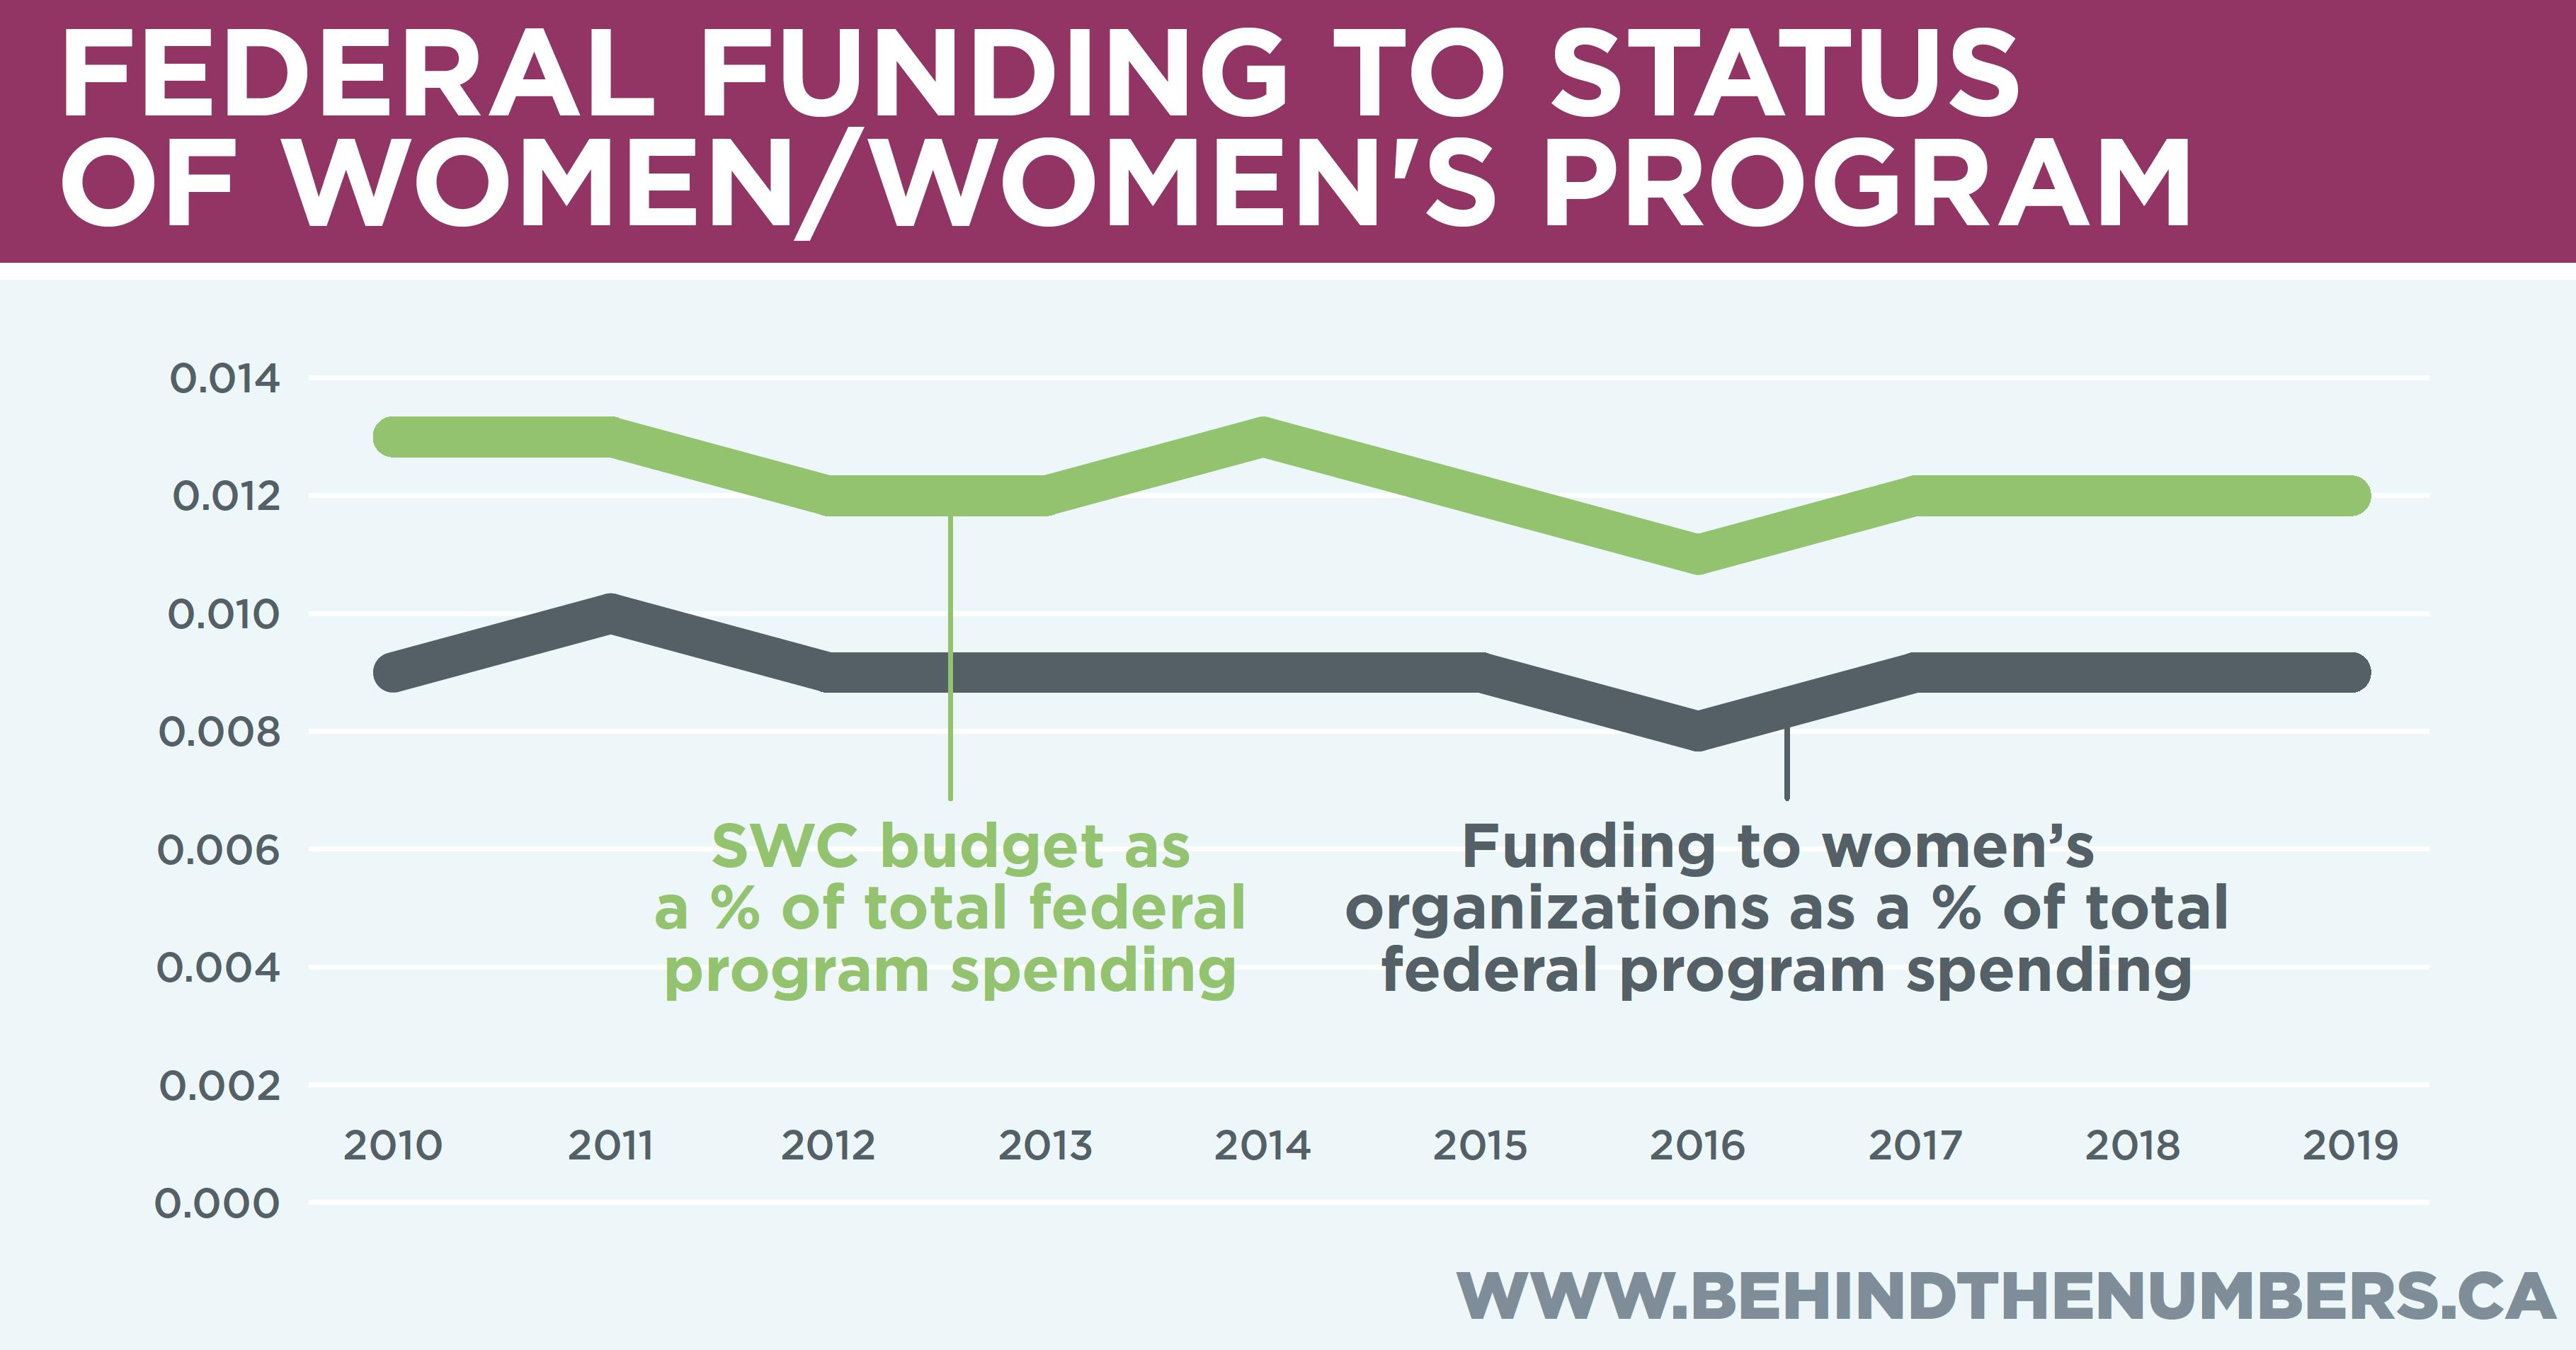 Funding to SWC